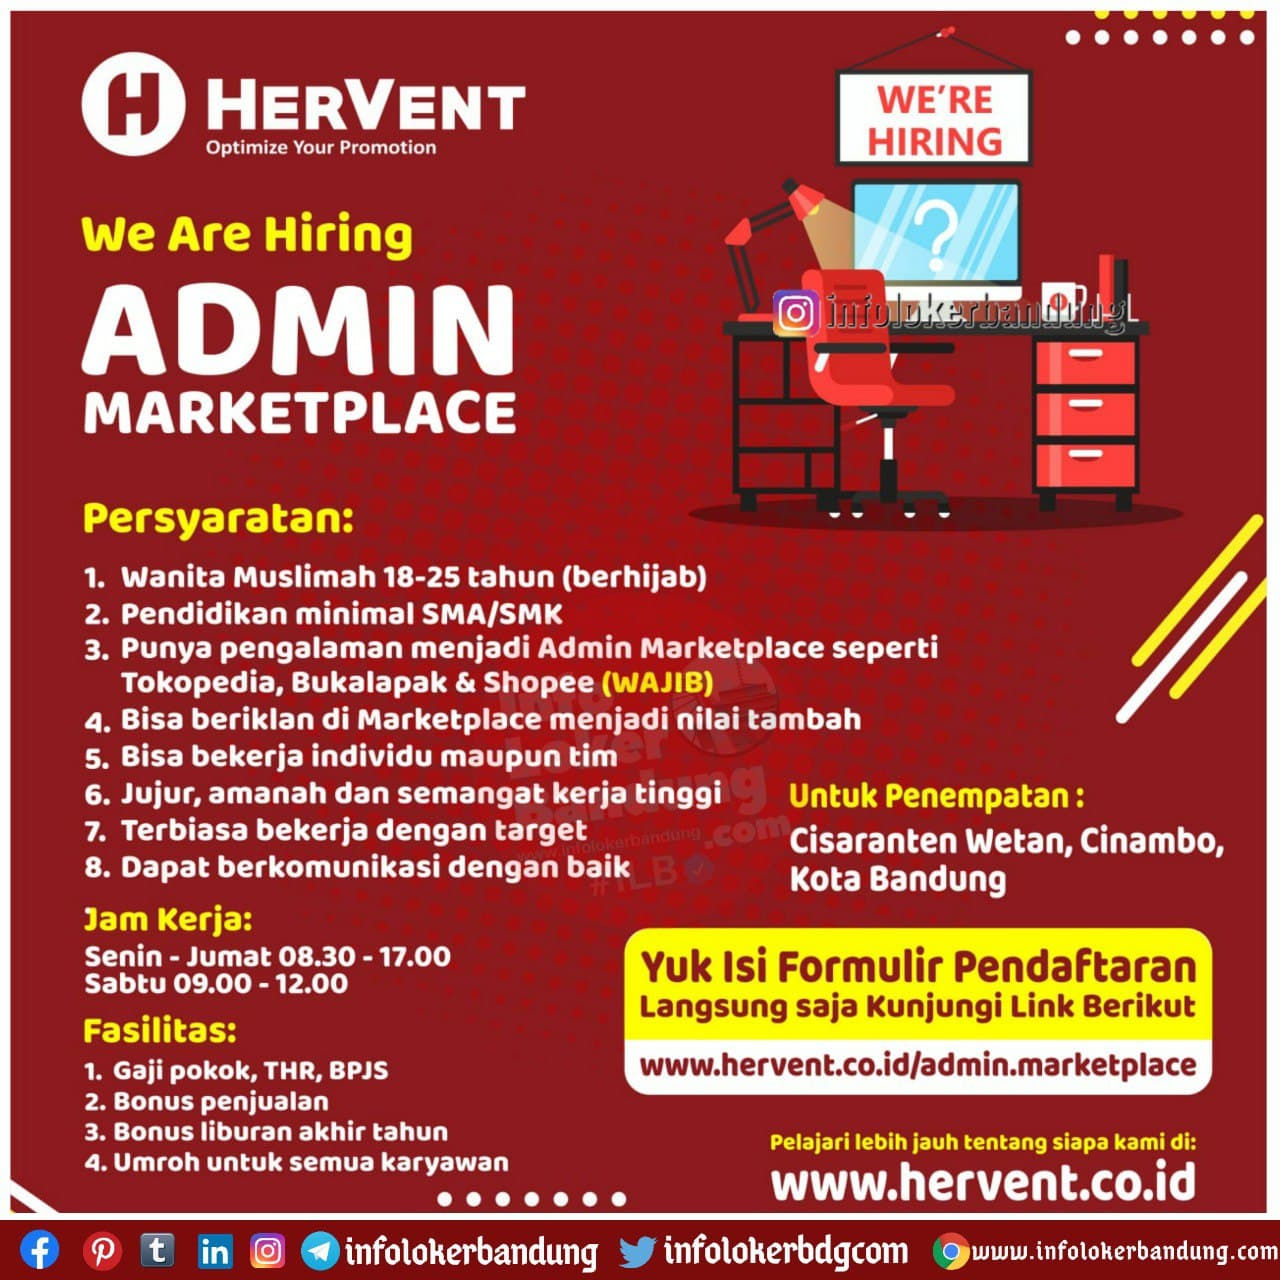 Lowongan Kerja Admin Marketplace Hervent Bandung Januari 2021